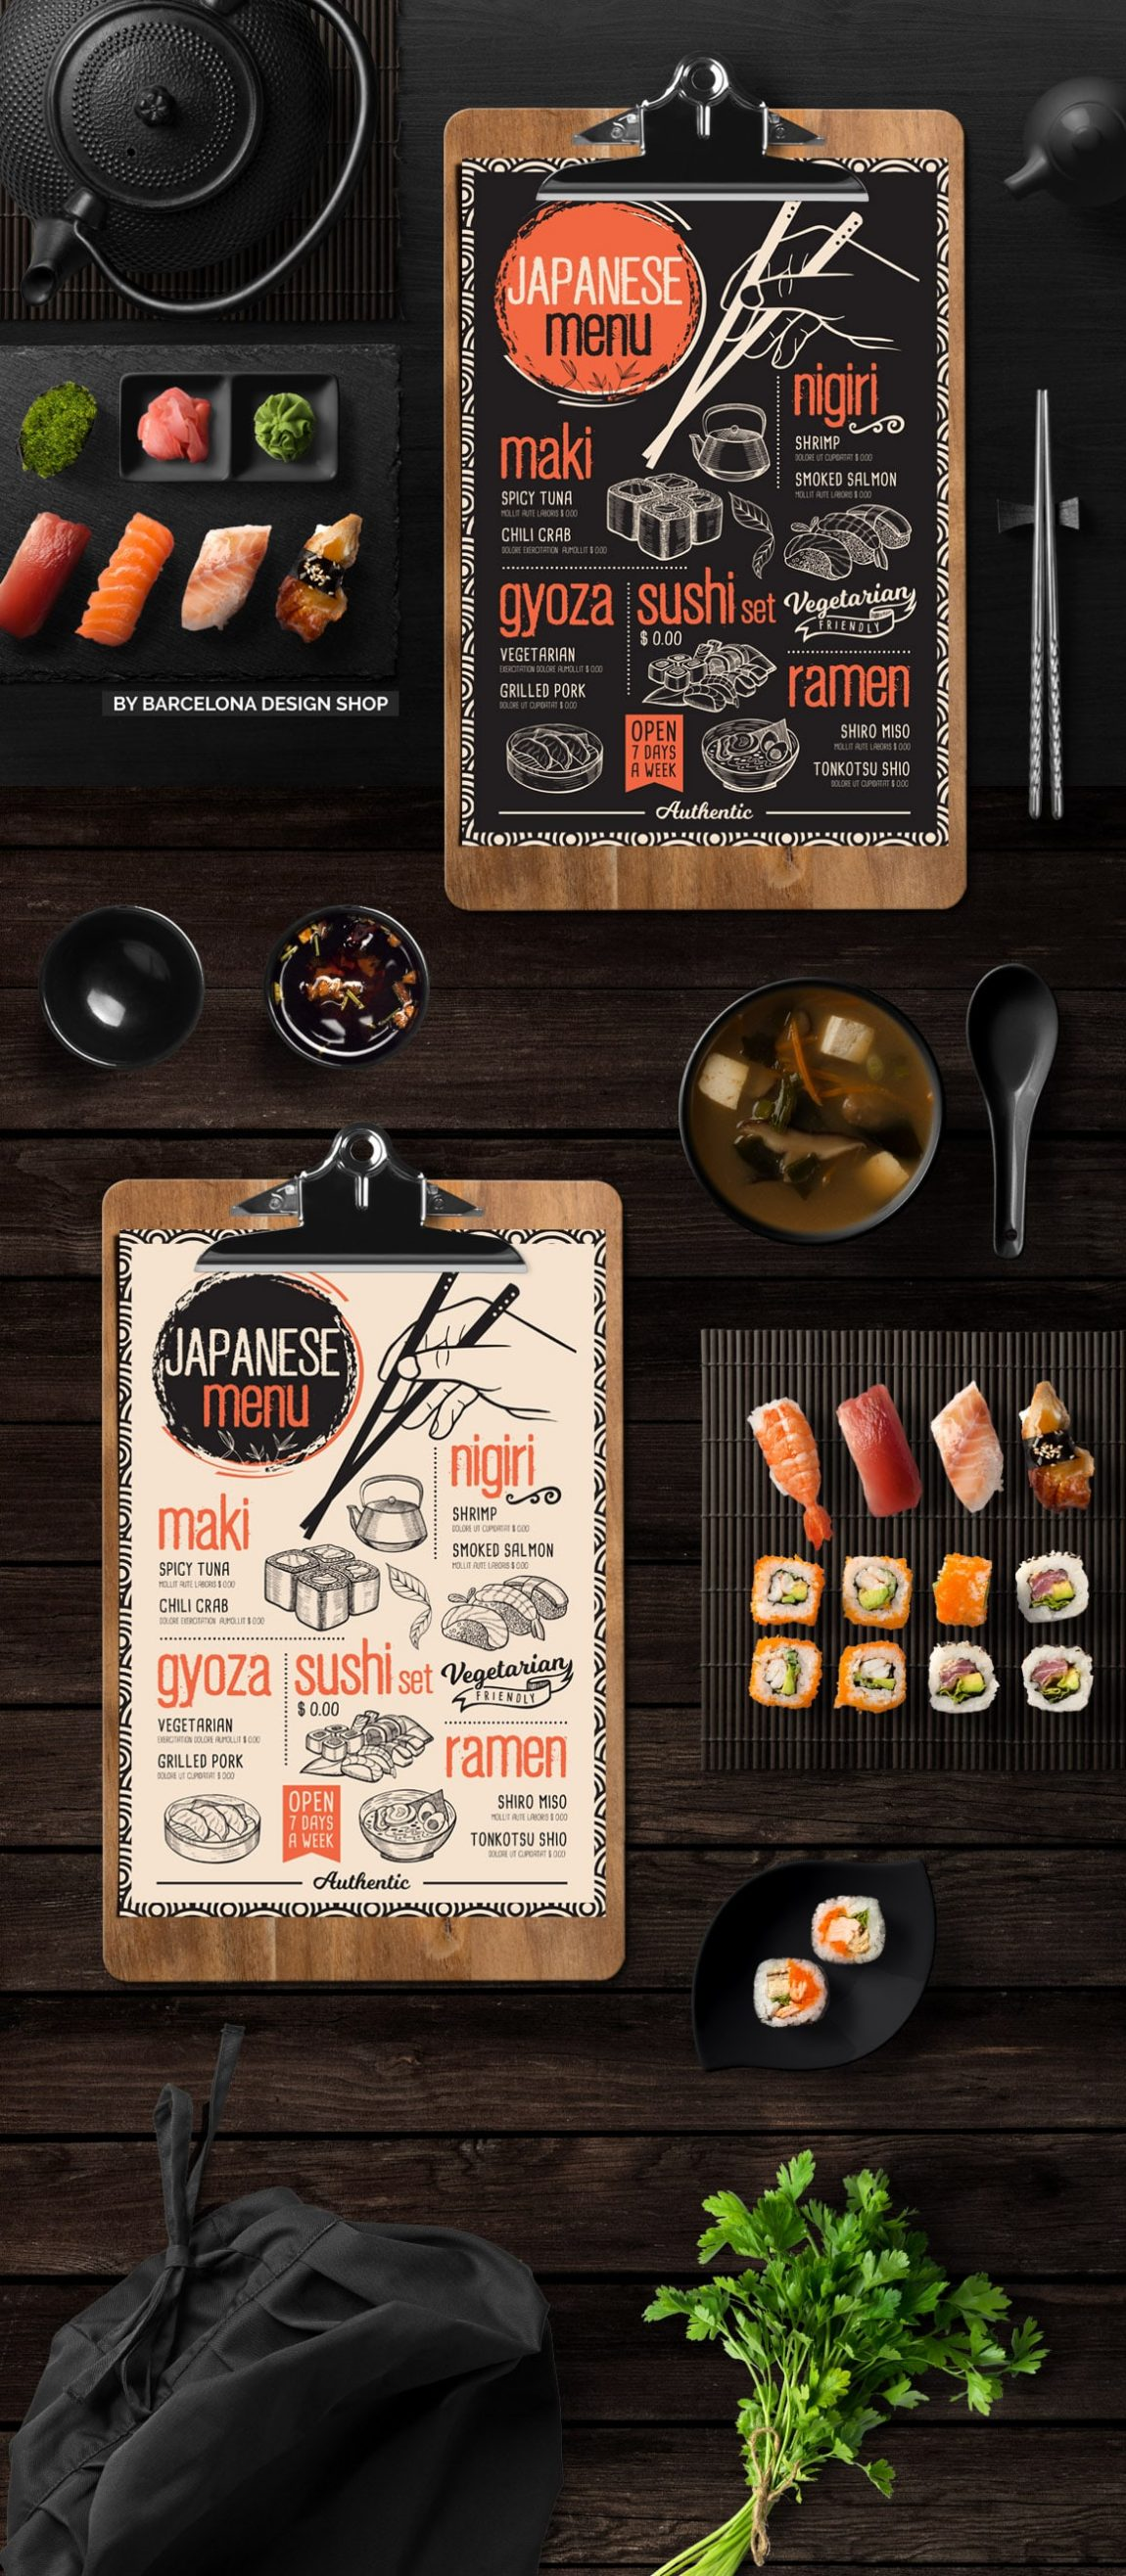 asian restaurant menu design barcelona design shop